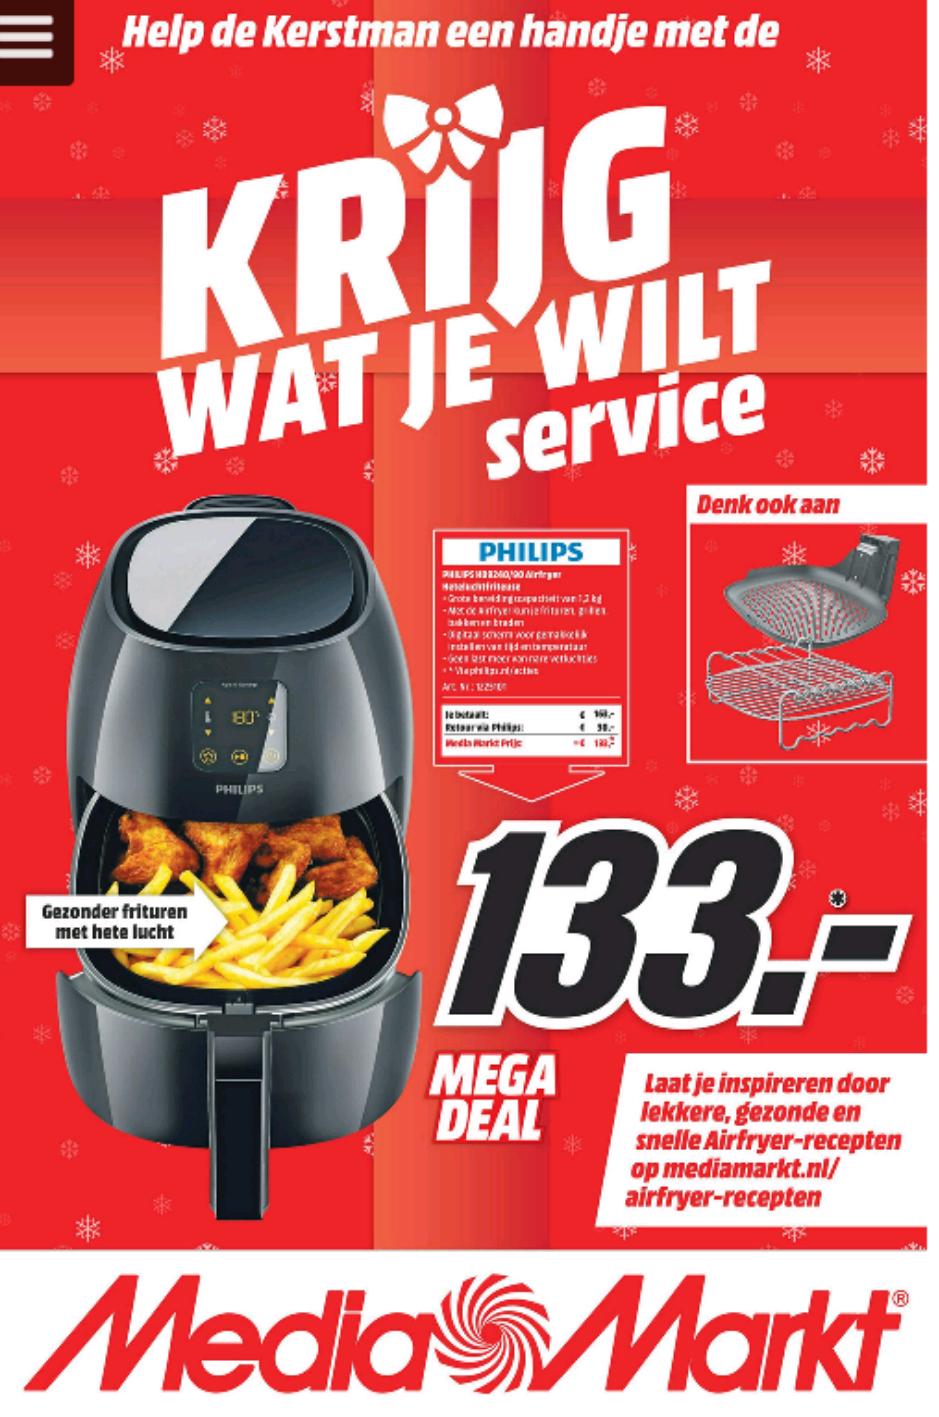 Philips airfryer 9240/90 voor €133 @ Mediamarkt